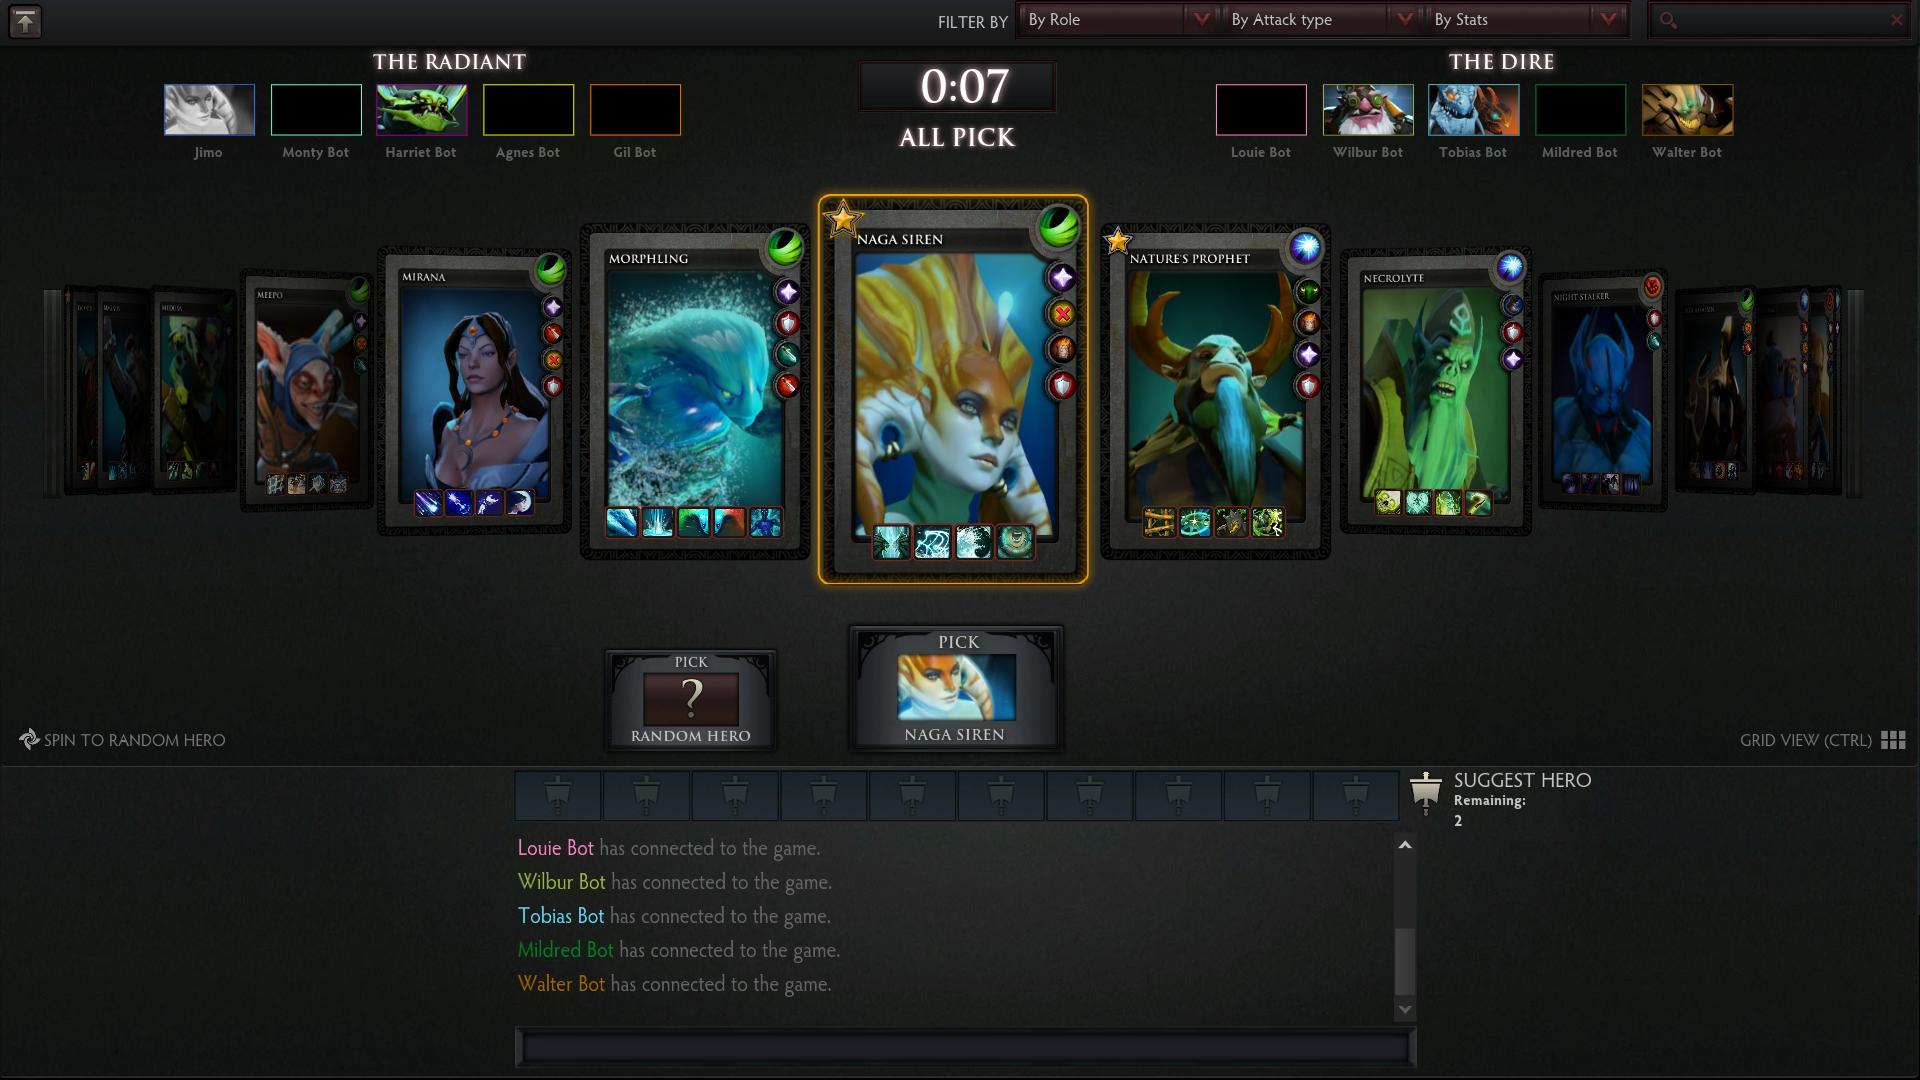 matchmaking mode